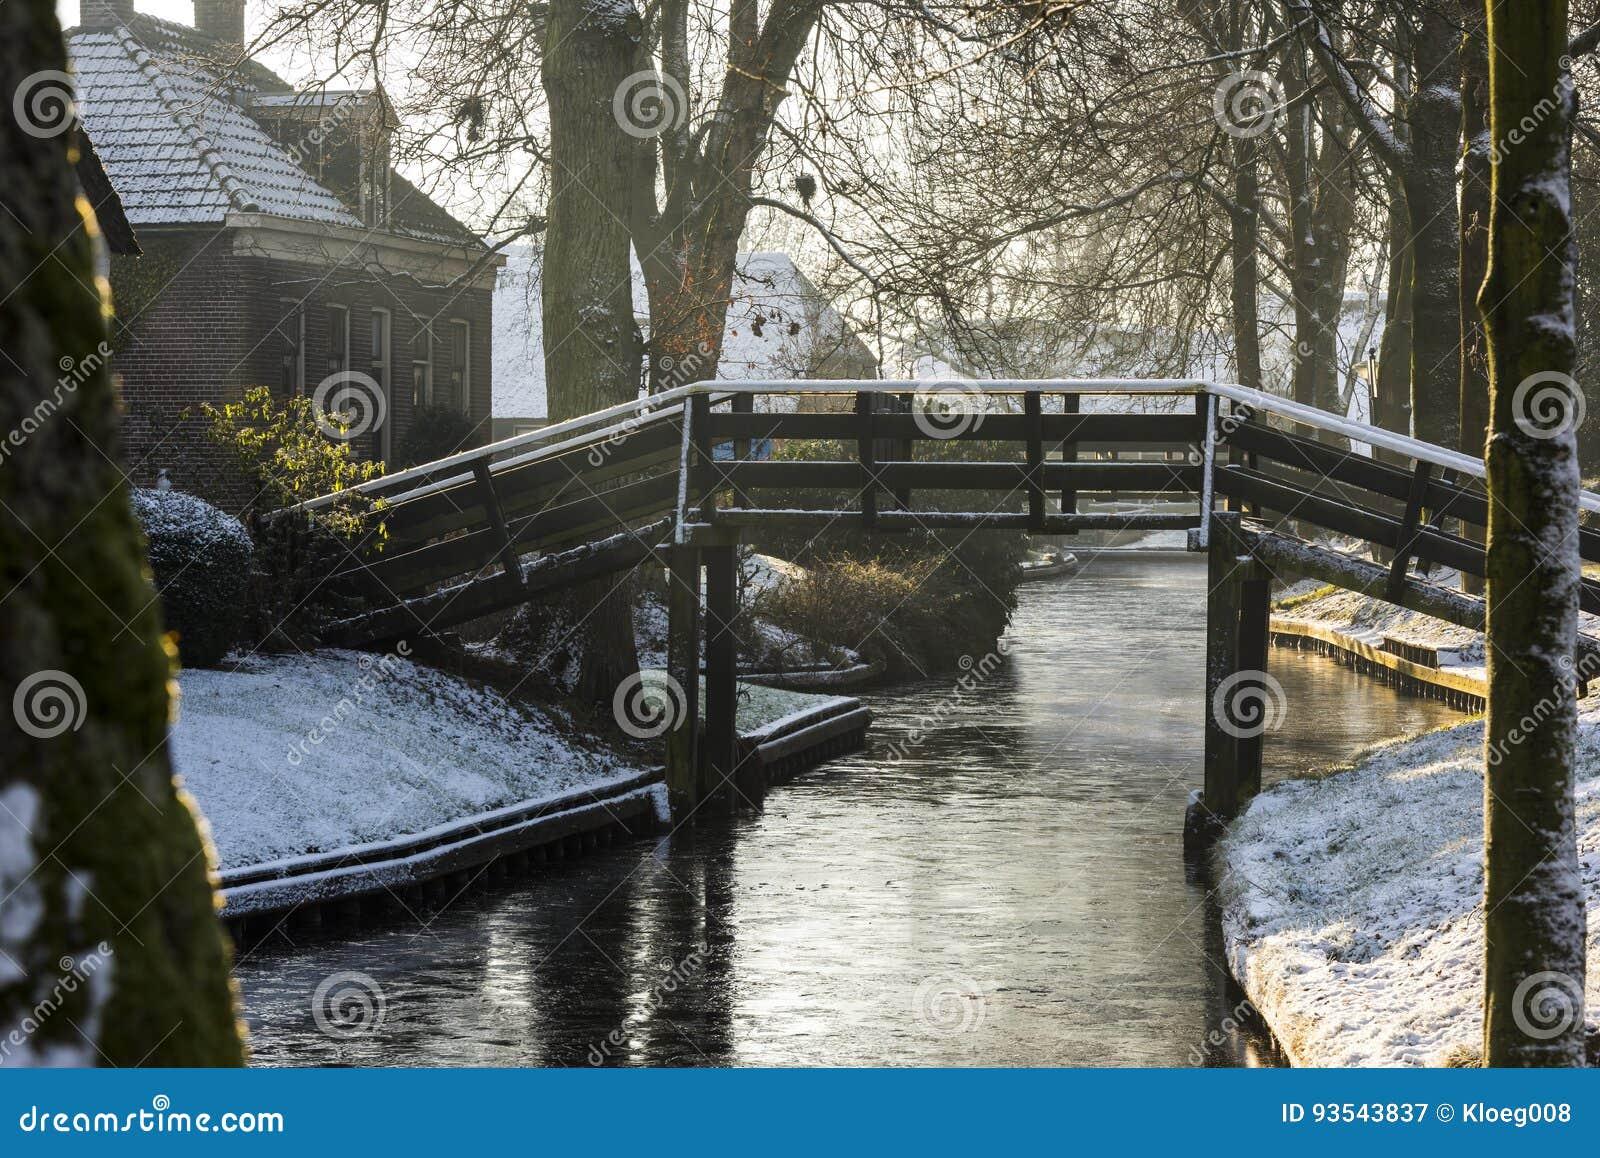 Winter In Giethoorn Stock Image Image Of Scene Roof 93543837